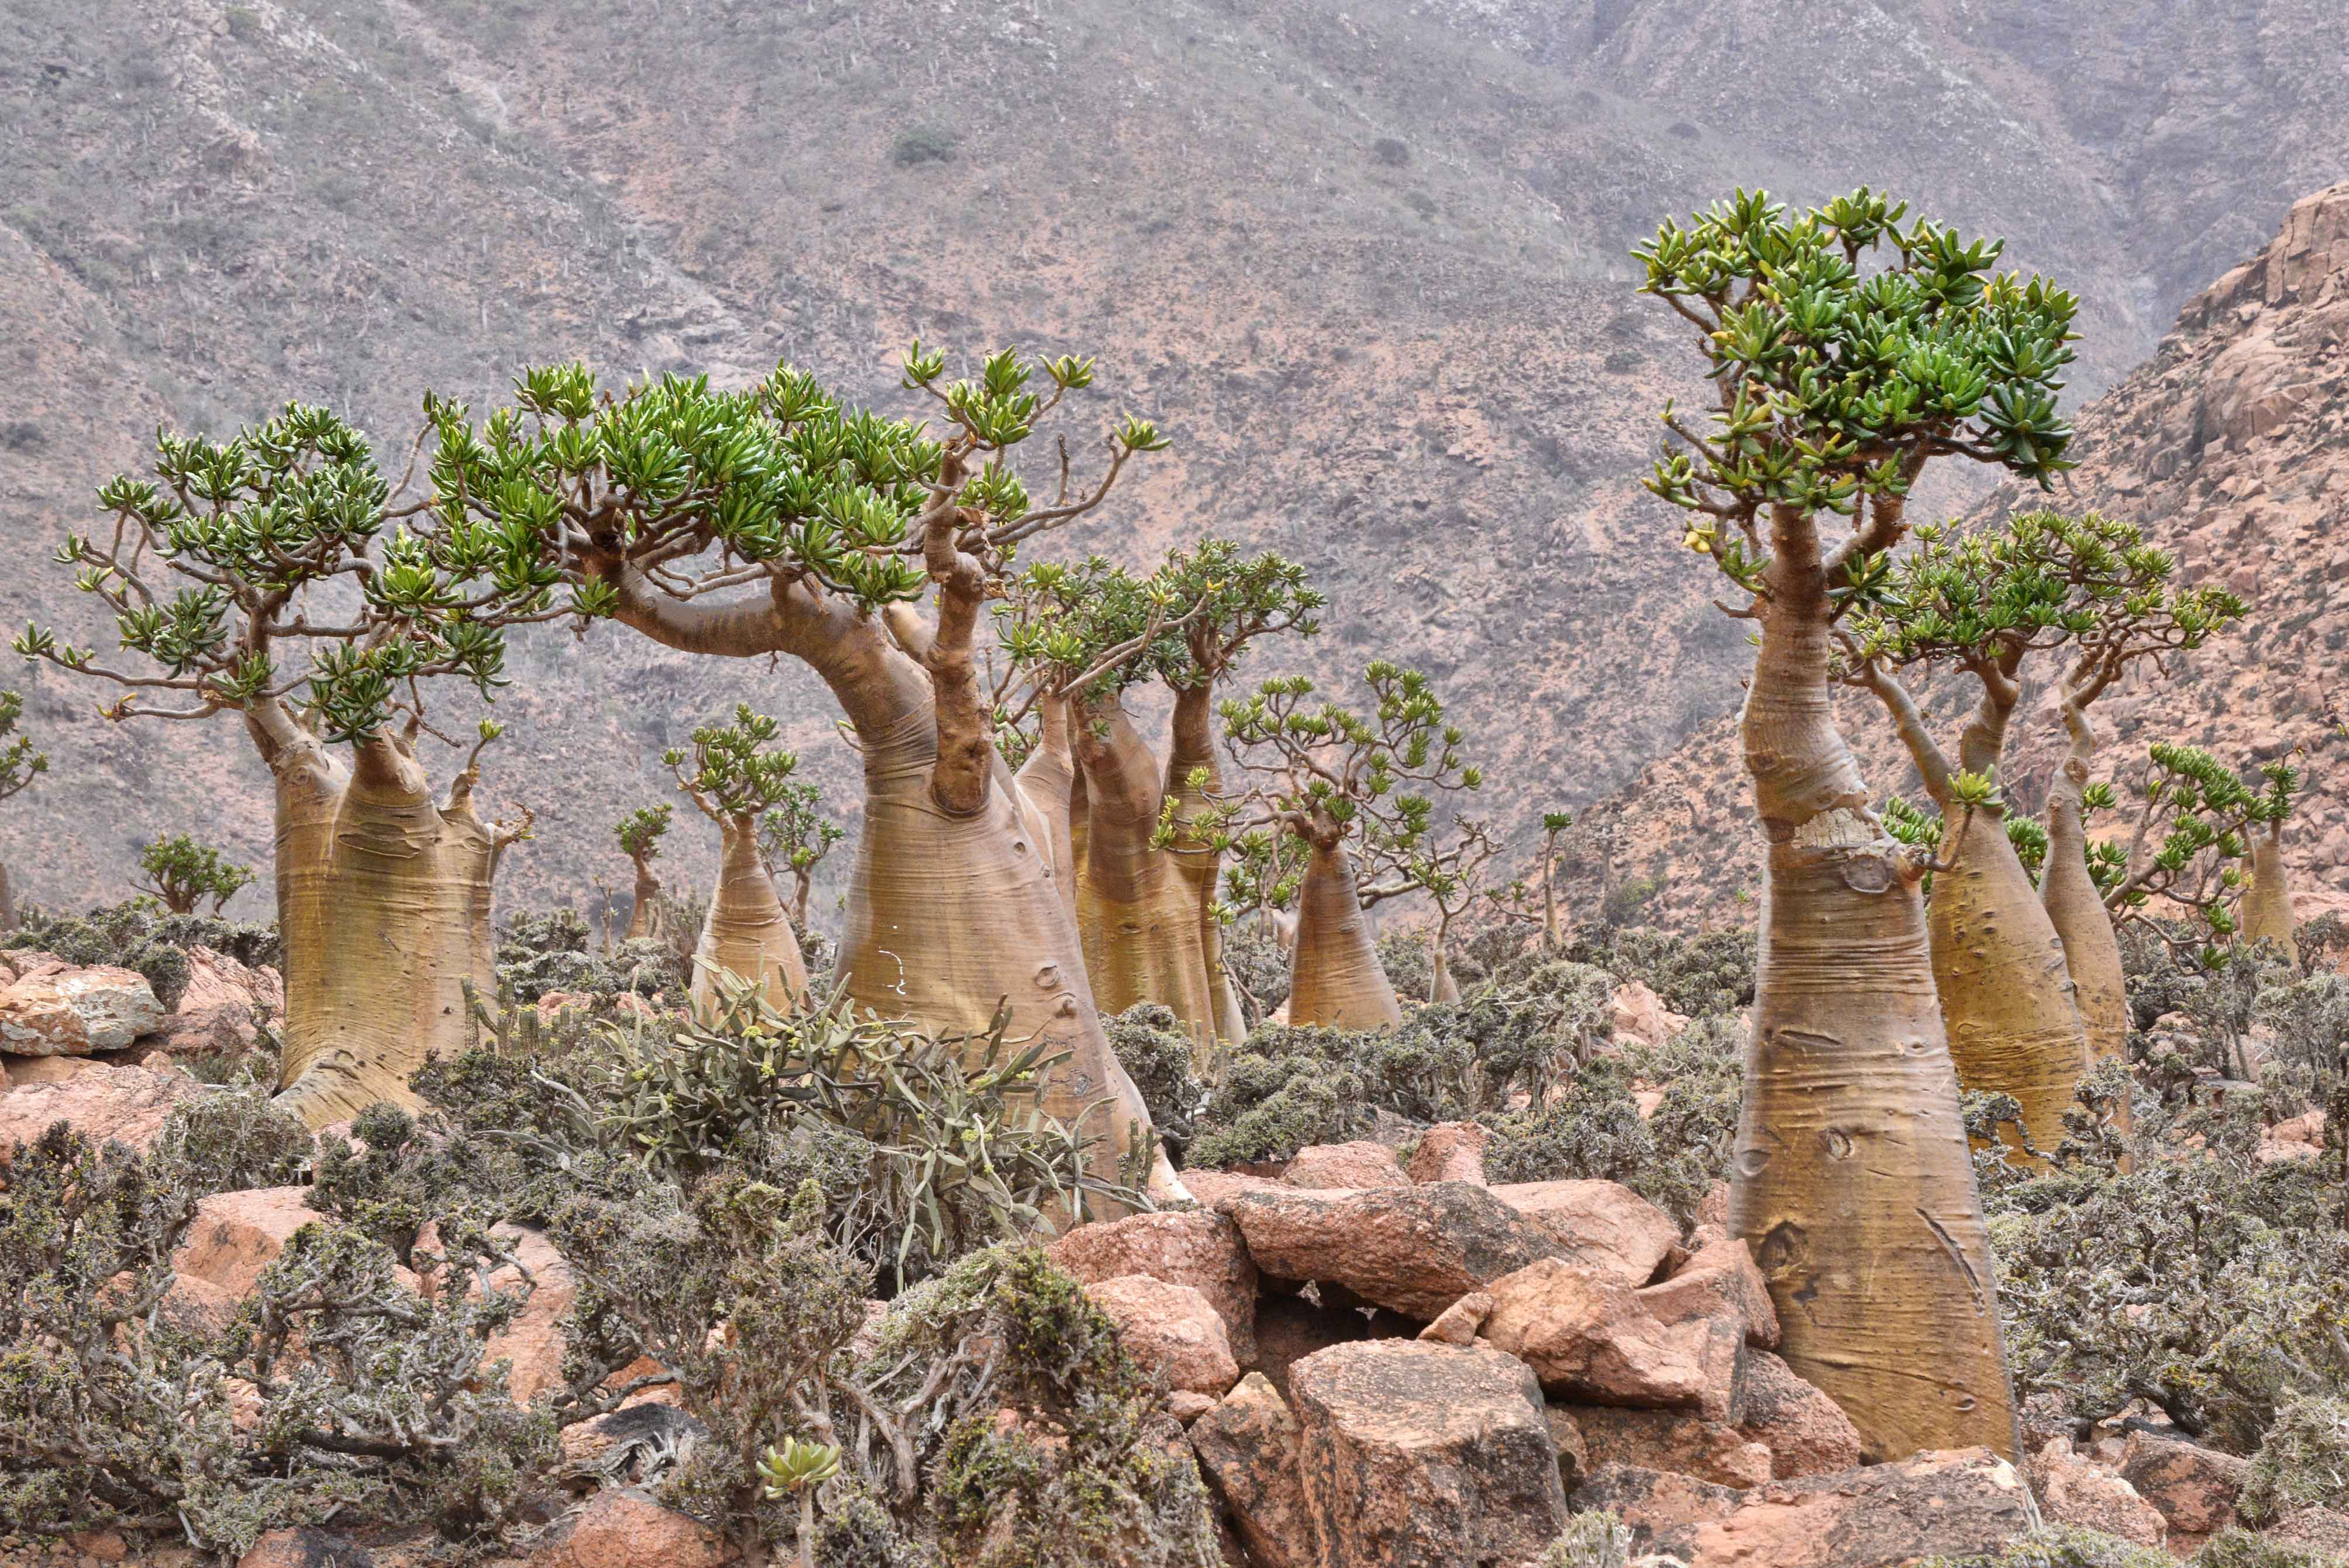 Bottle_Trees_Socotra_Island_9888518324